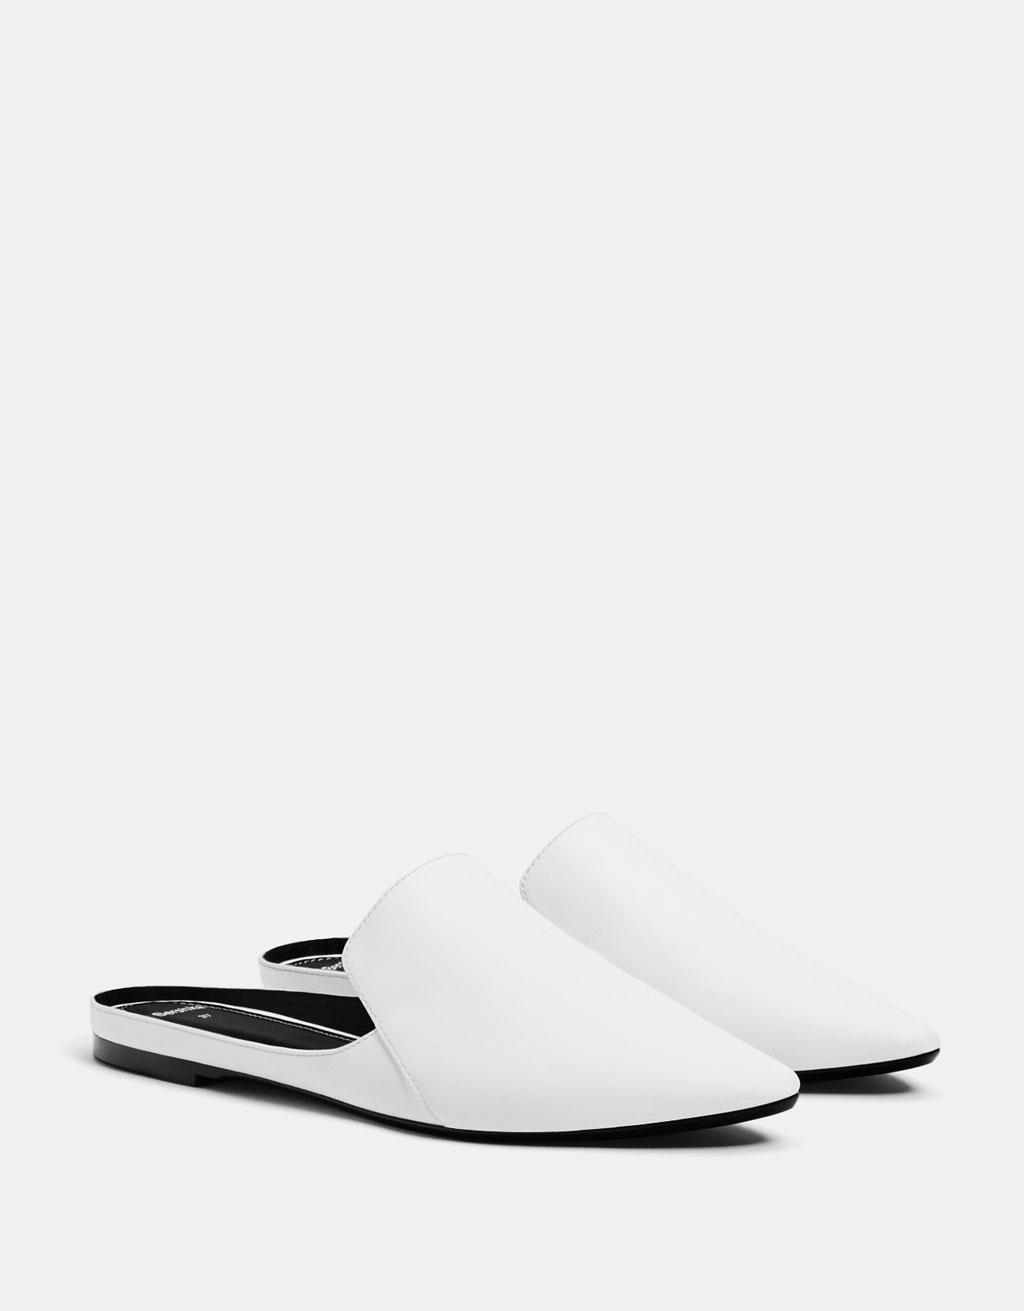 Zapato plano destalonado